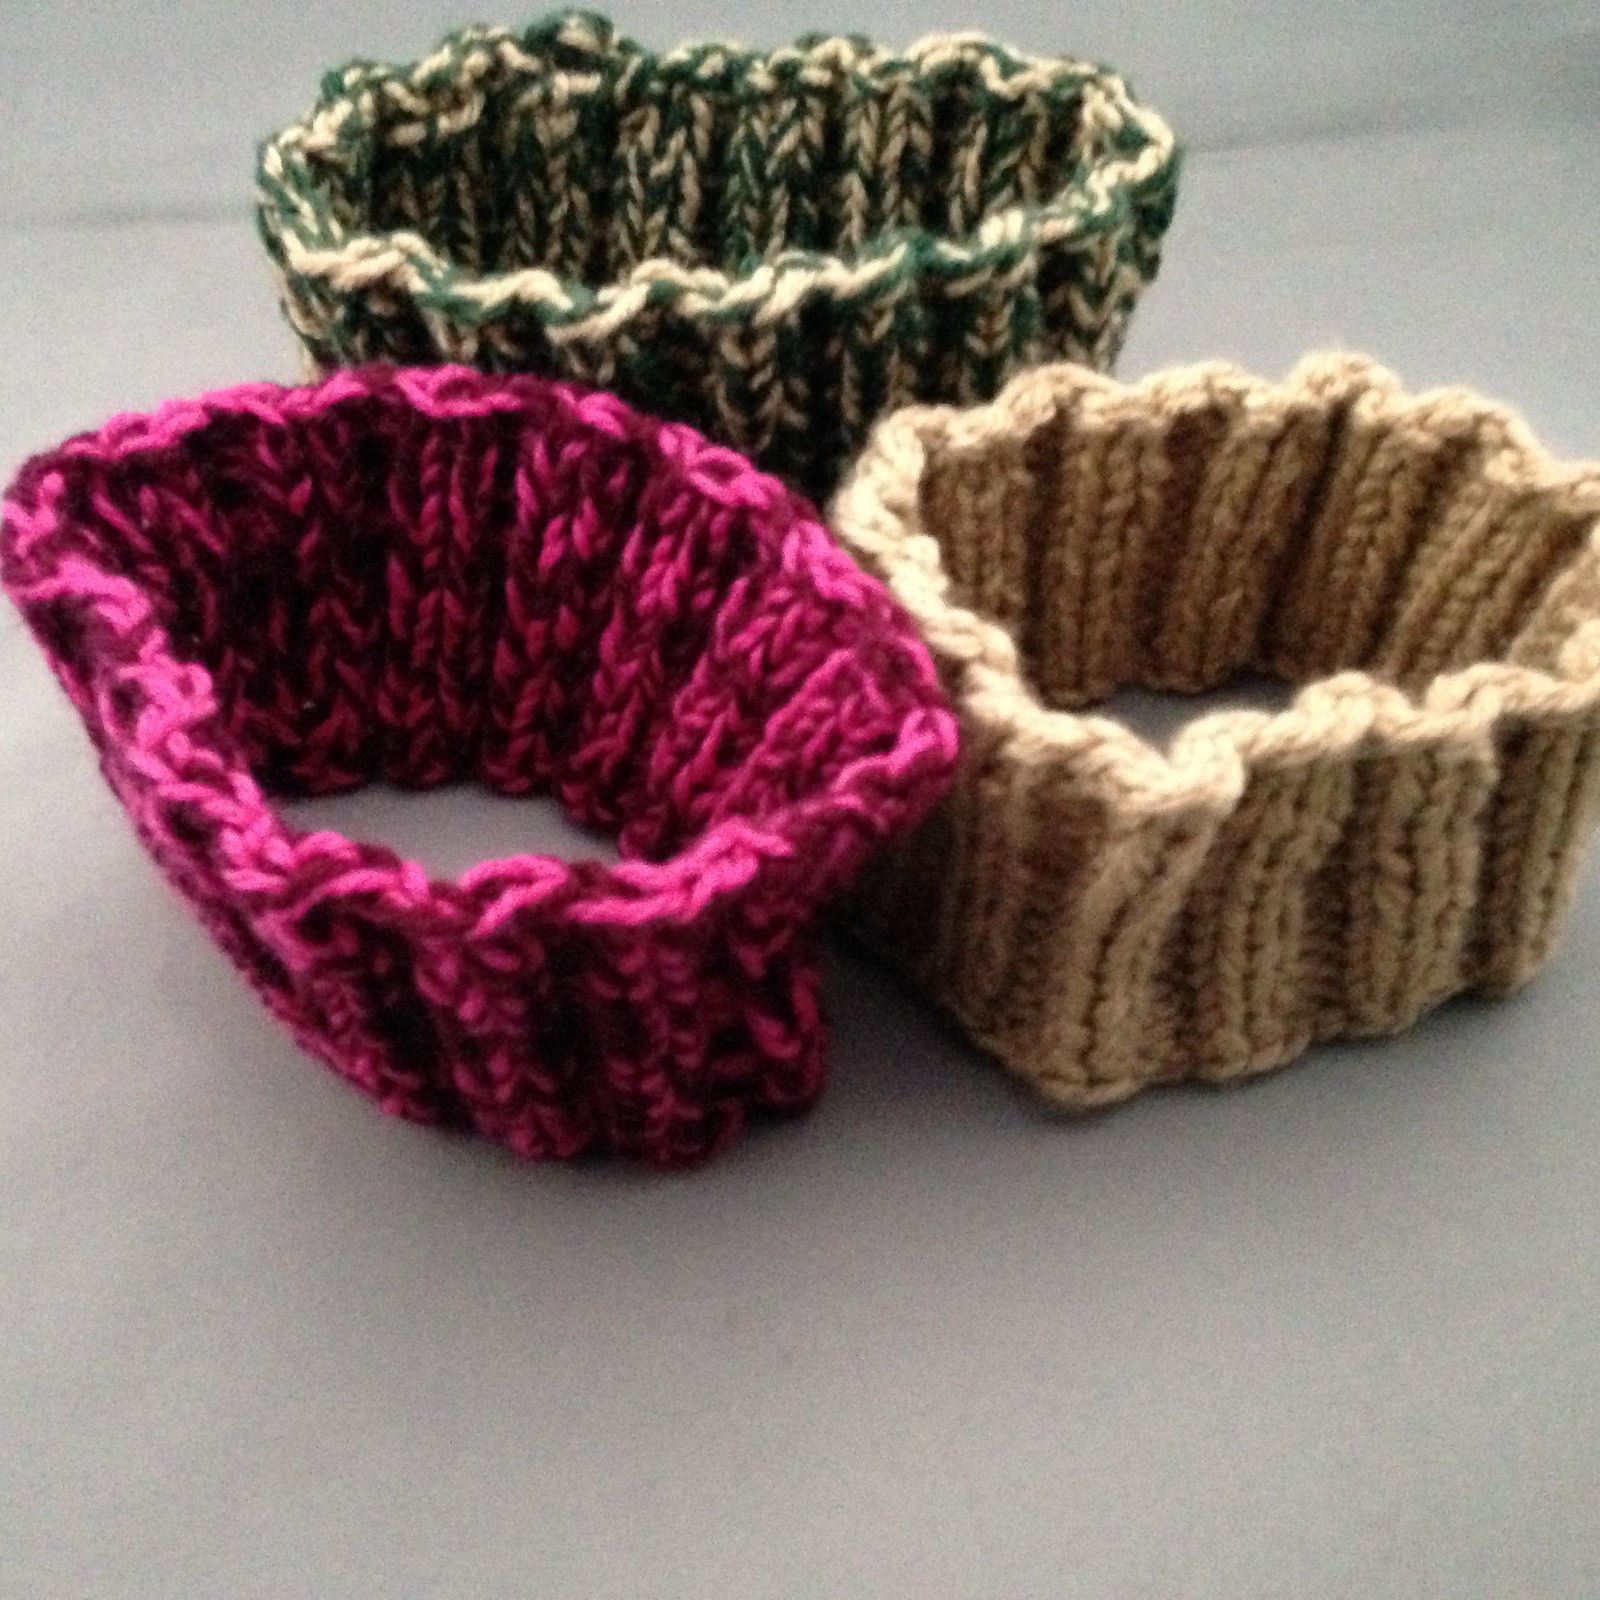 Ravelry: Easy Headband (Ear warmers) by Lauras Knits ...